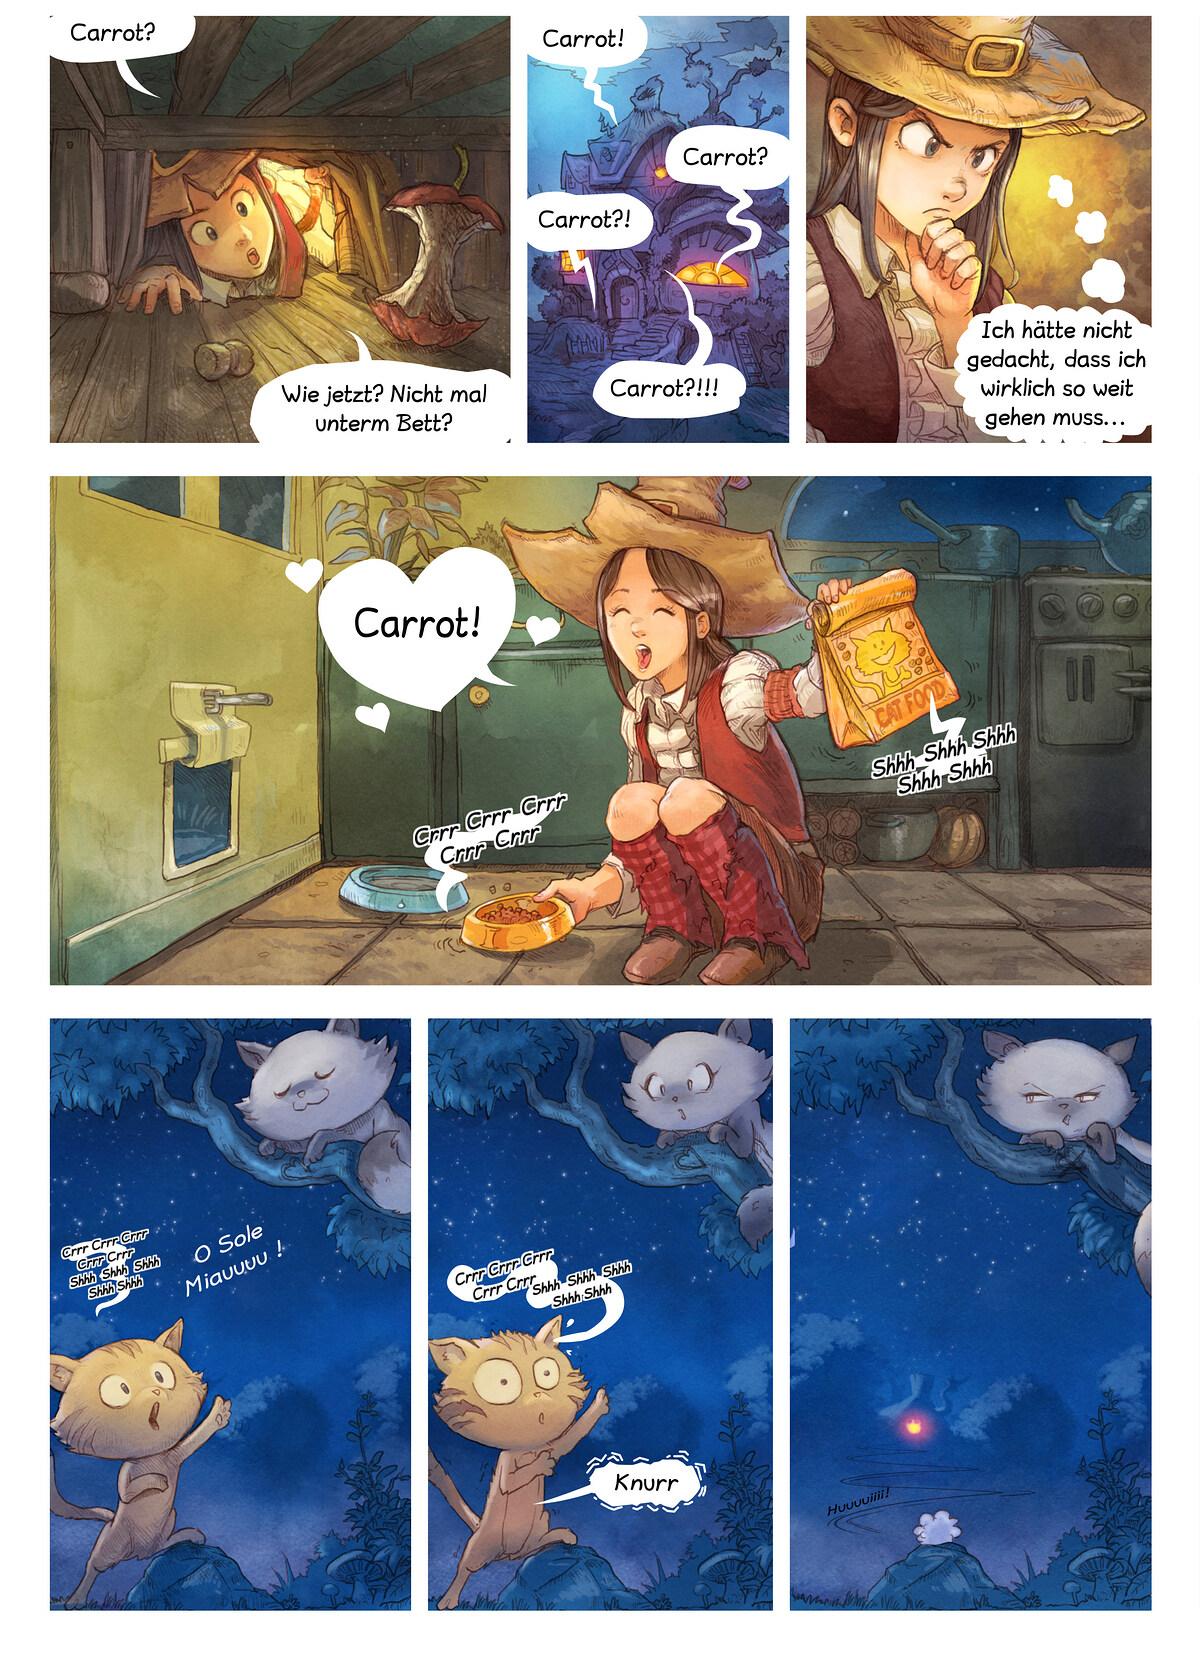 A webcomic page of Pepper&Carrot, Episode 4 [de], Seite 2